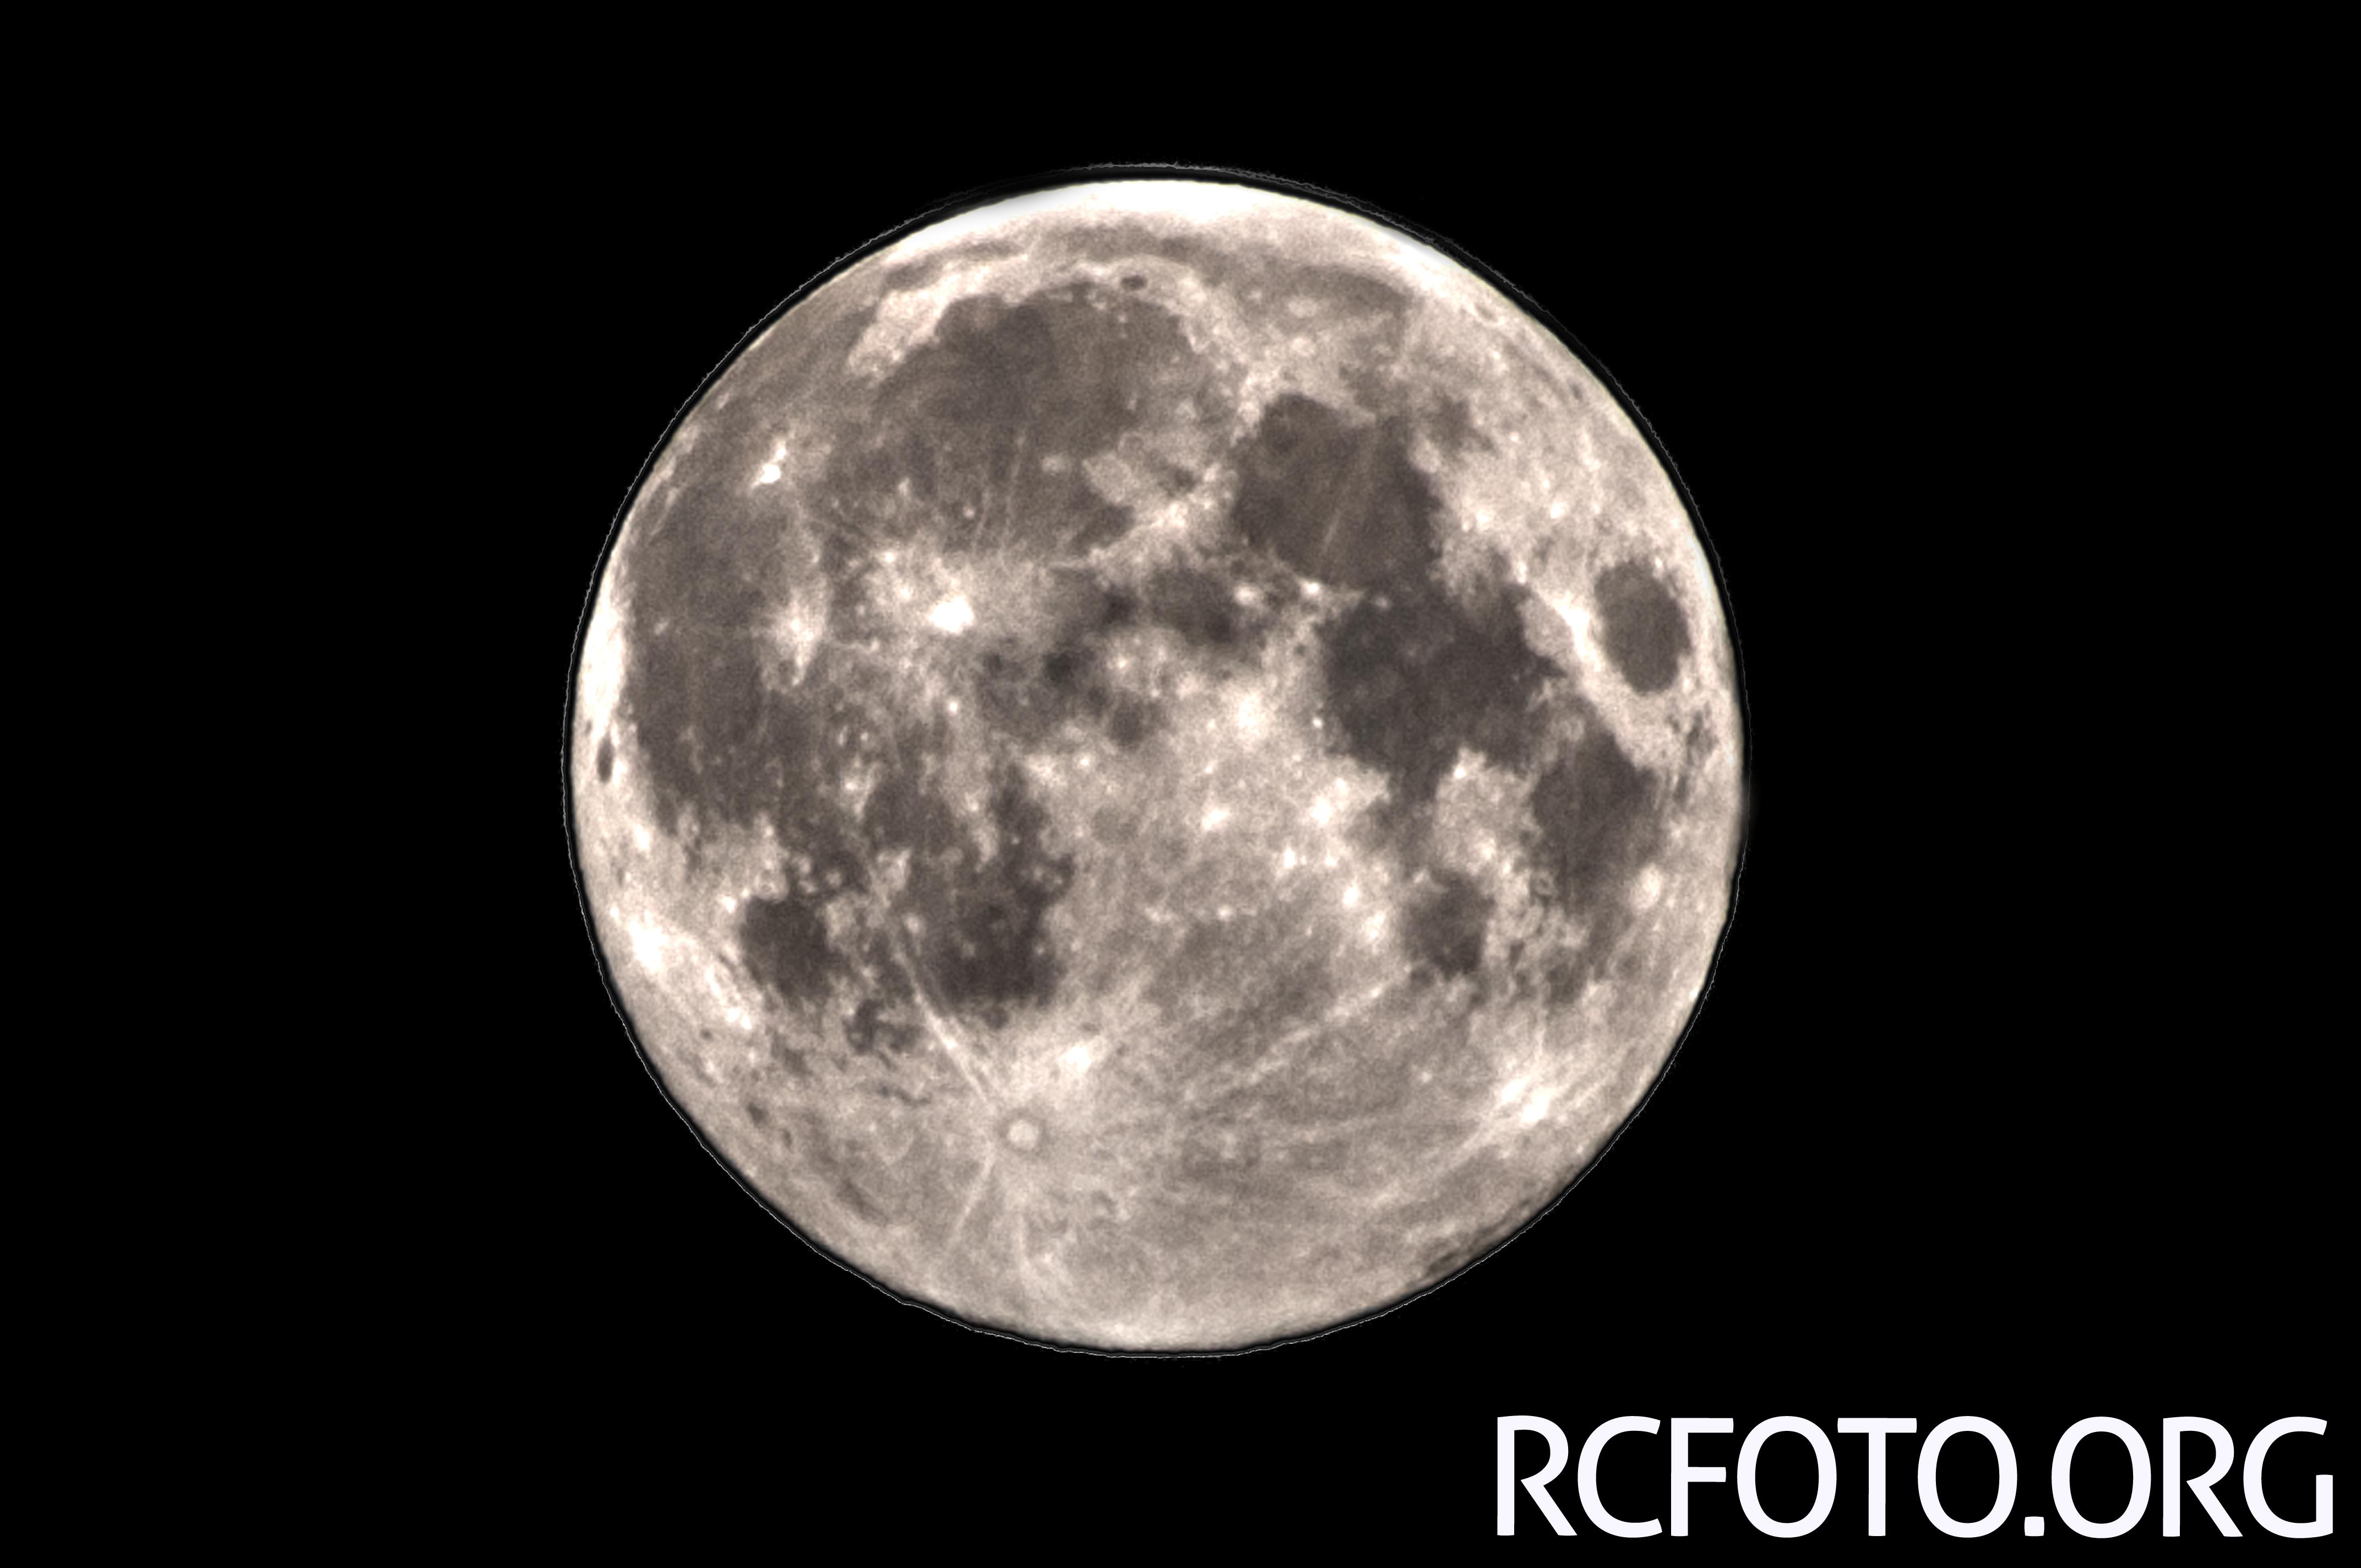 RCF_0050G